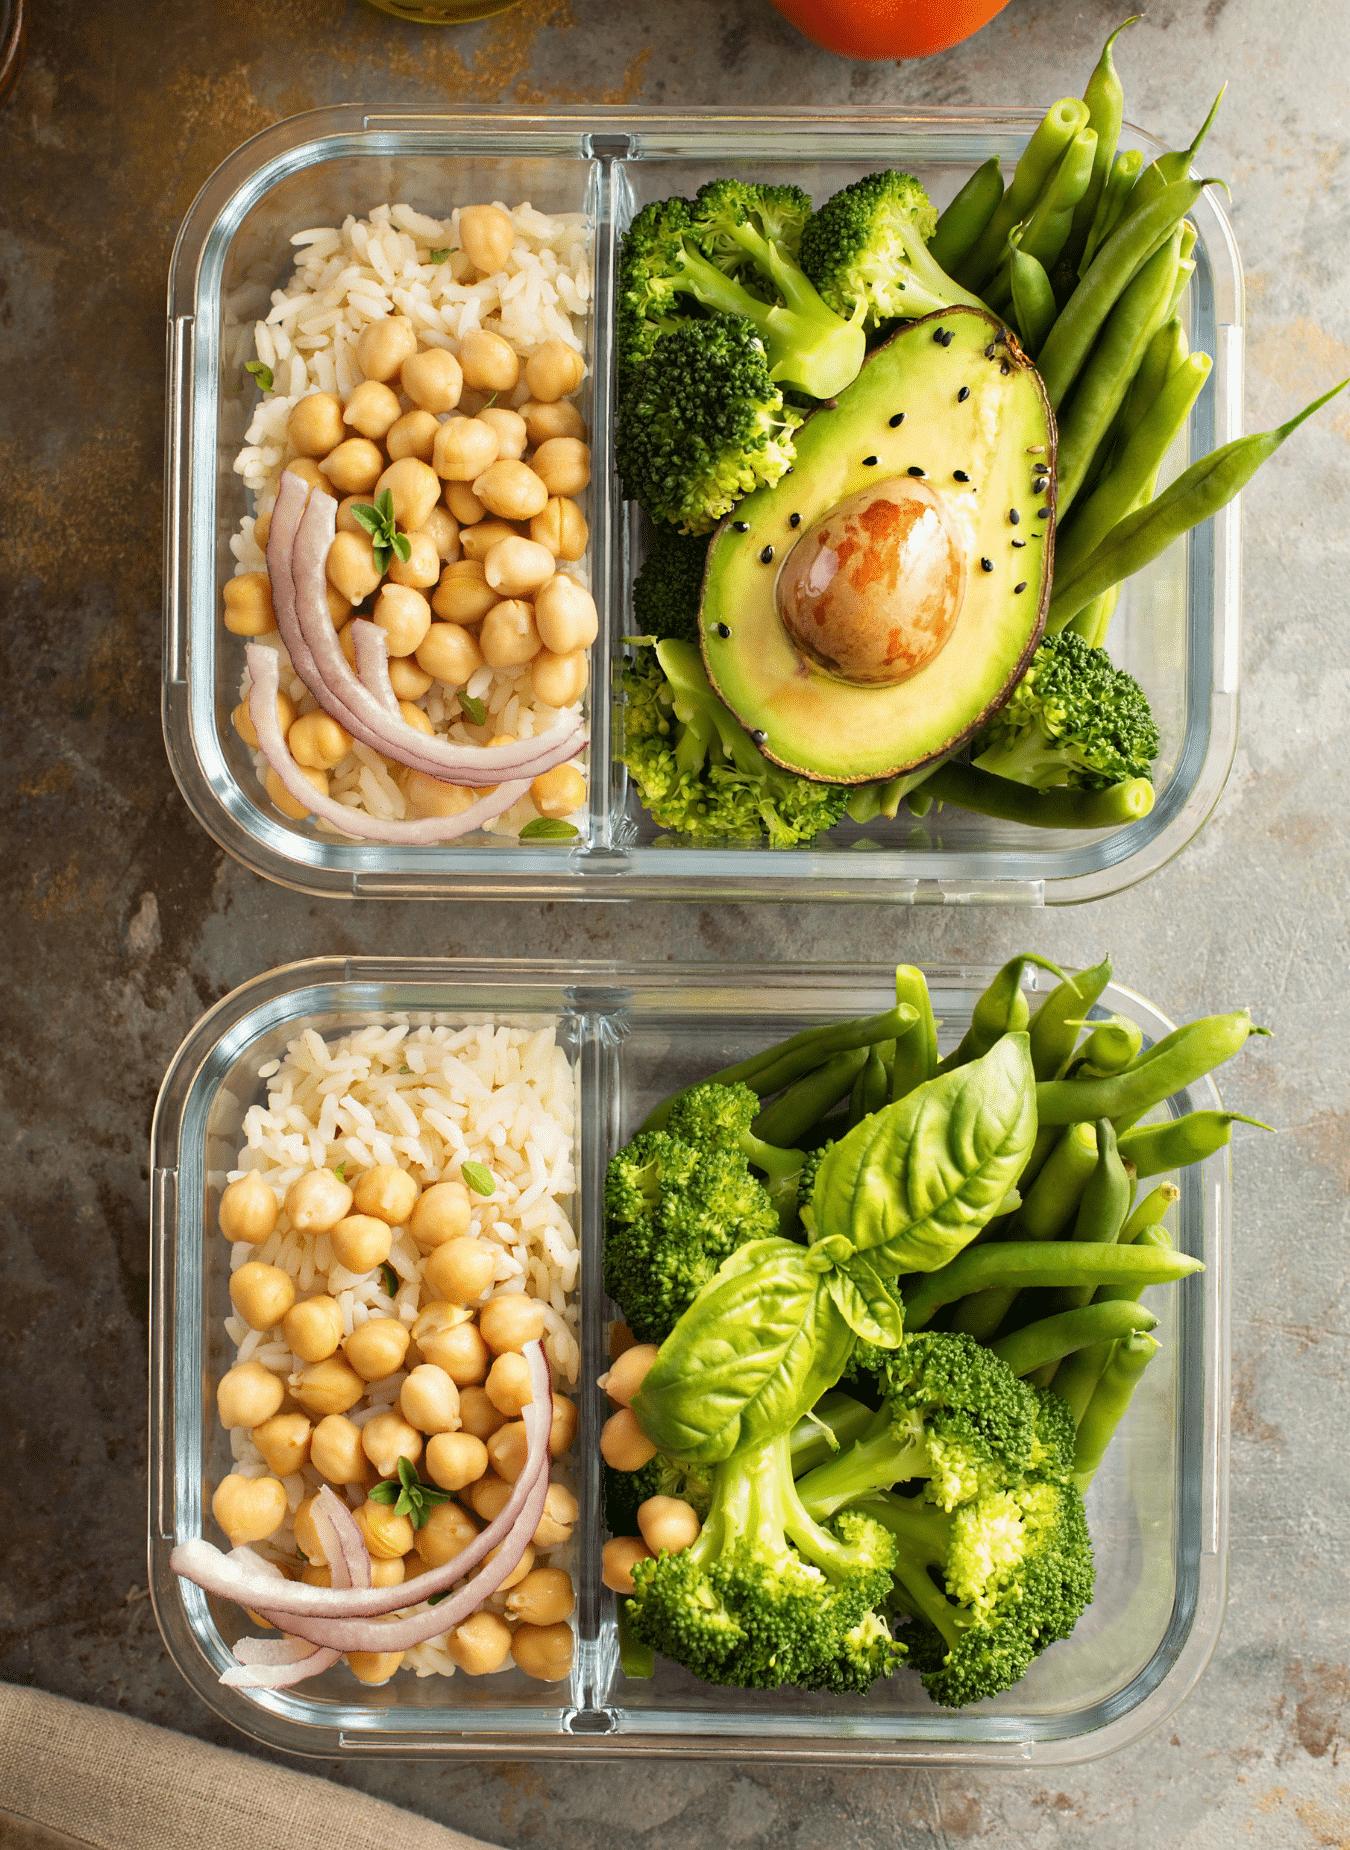 Vegan Meal Prep on a Budget